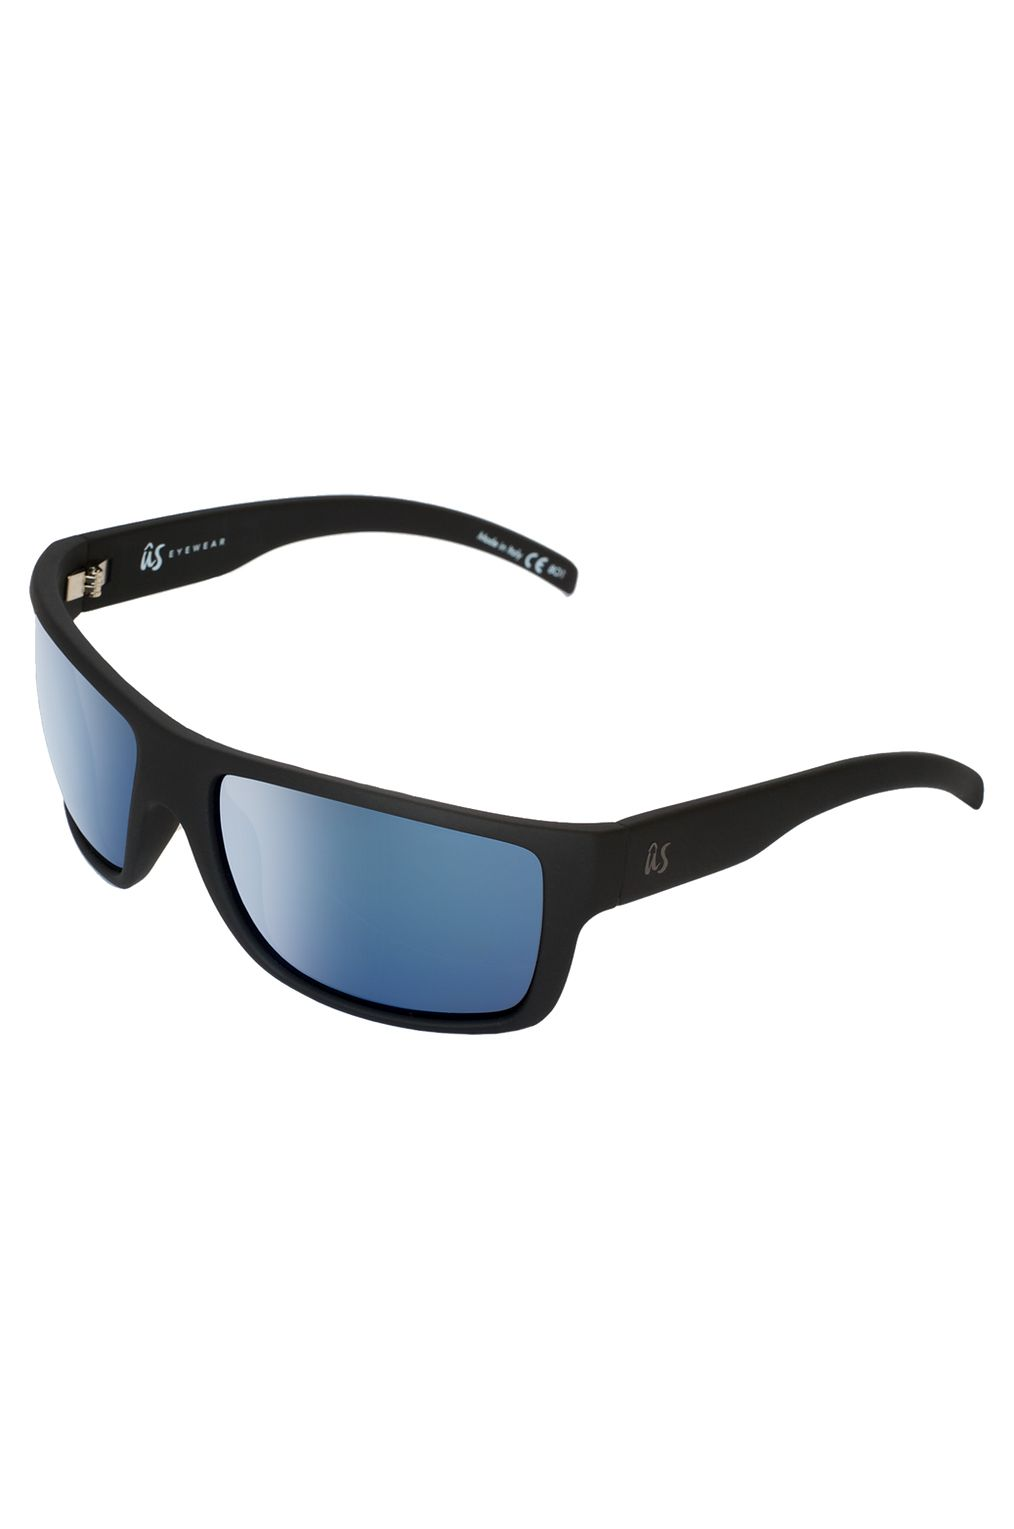 Oculos US TATOU Matte Black/Grey Blue Chrome